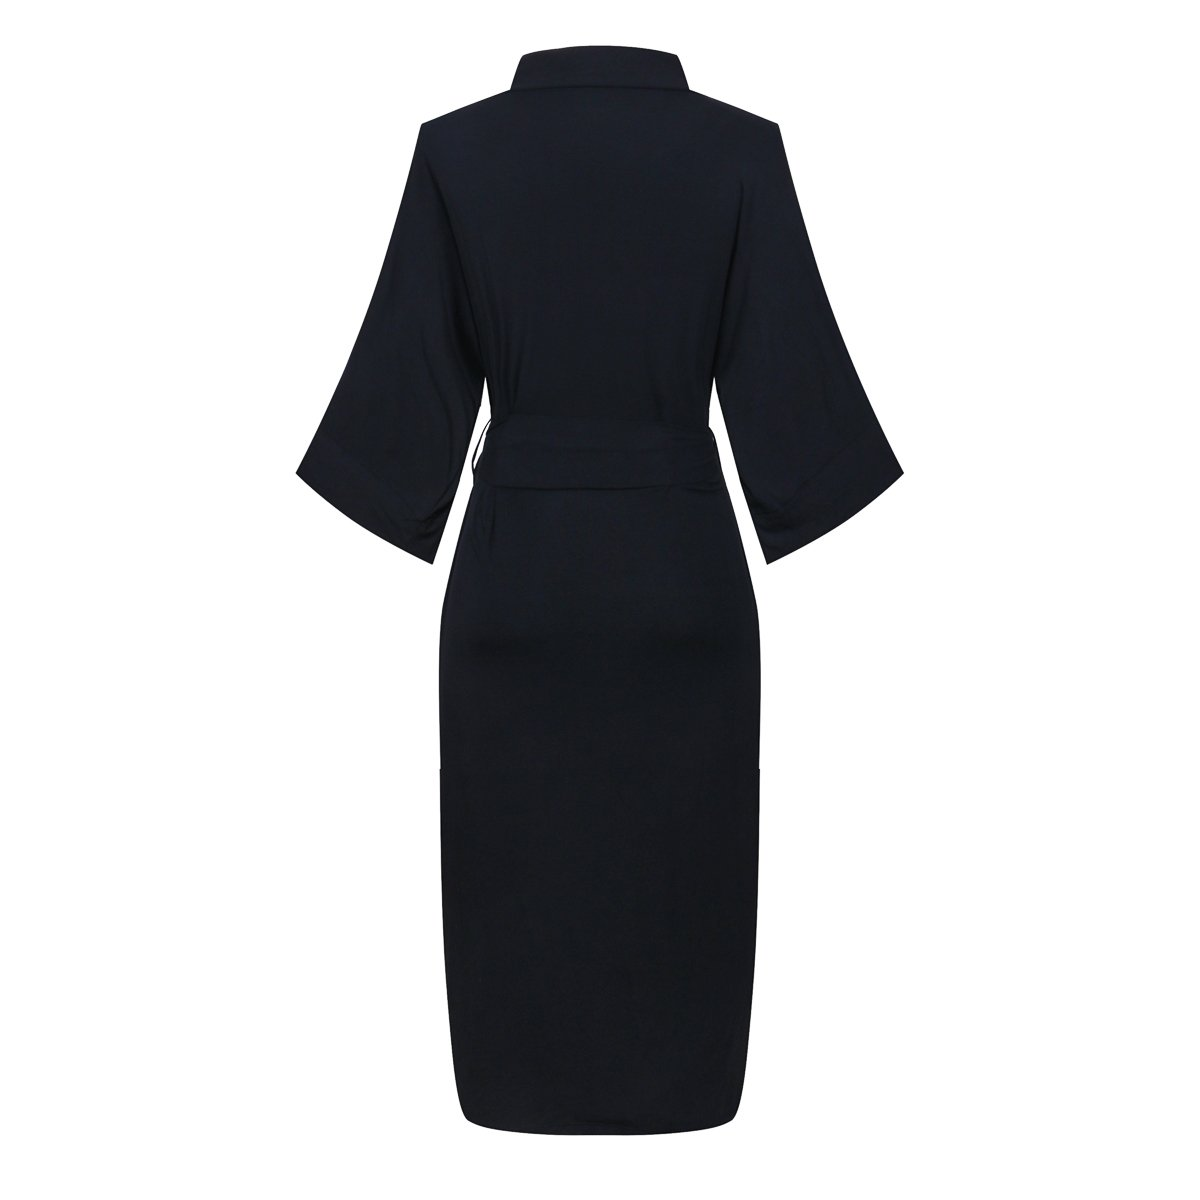 c47f46b23d Amazon.com  DandyChic Women s Knit Long Kimono Robe Bathrobe Nightgown  Pure  Clothing